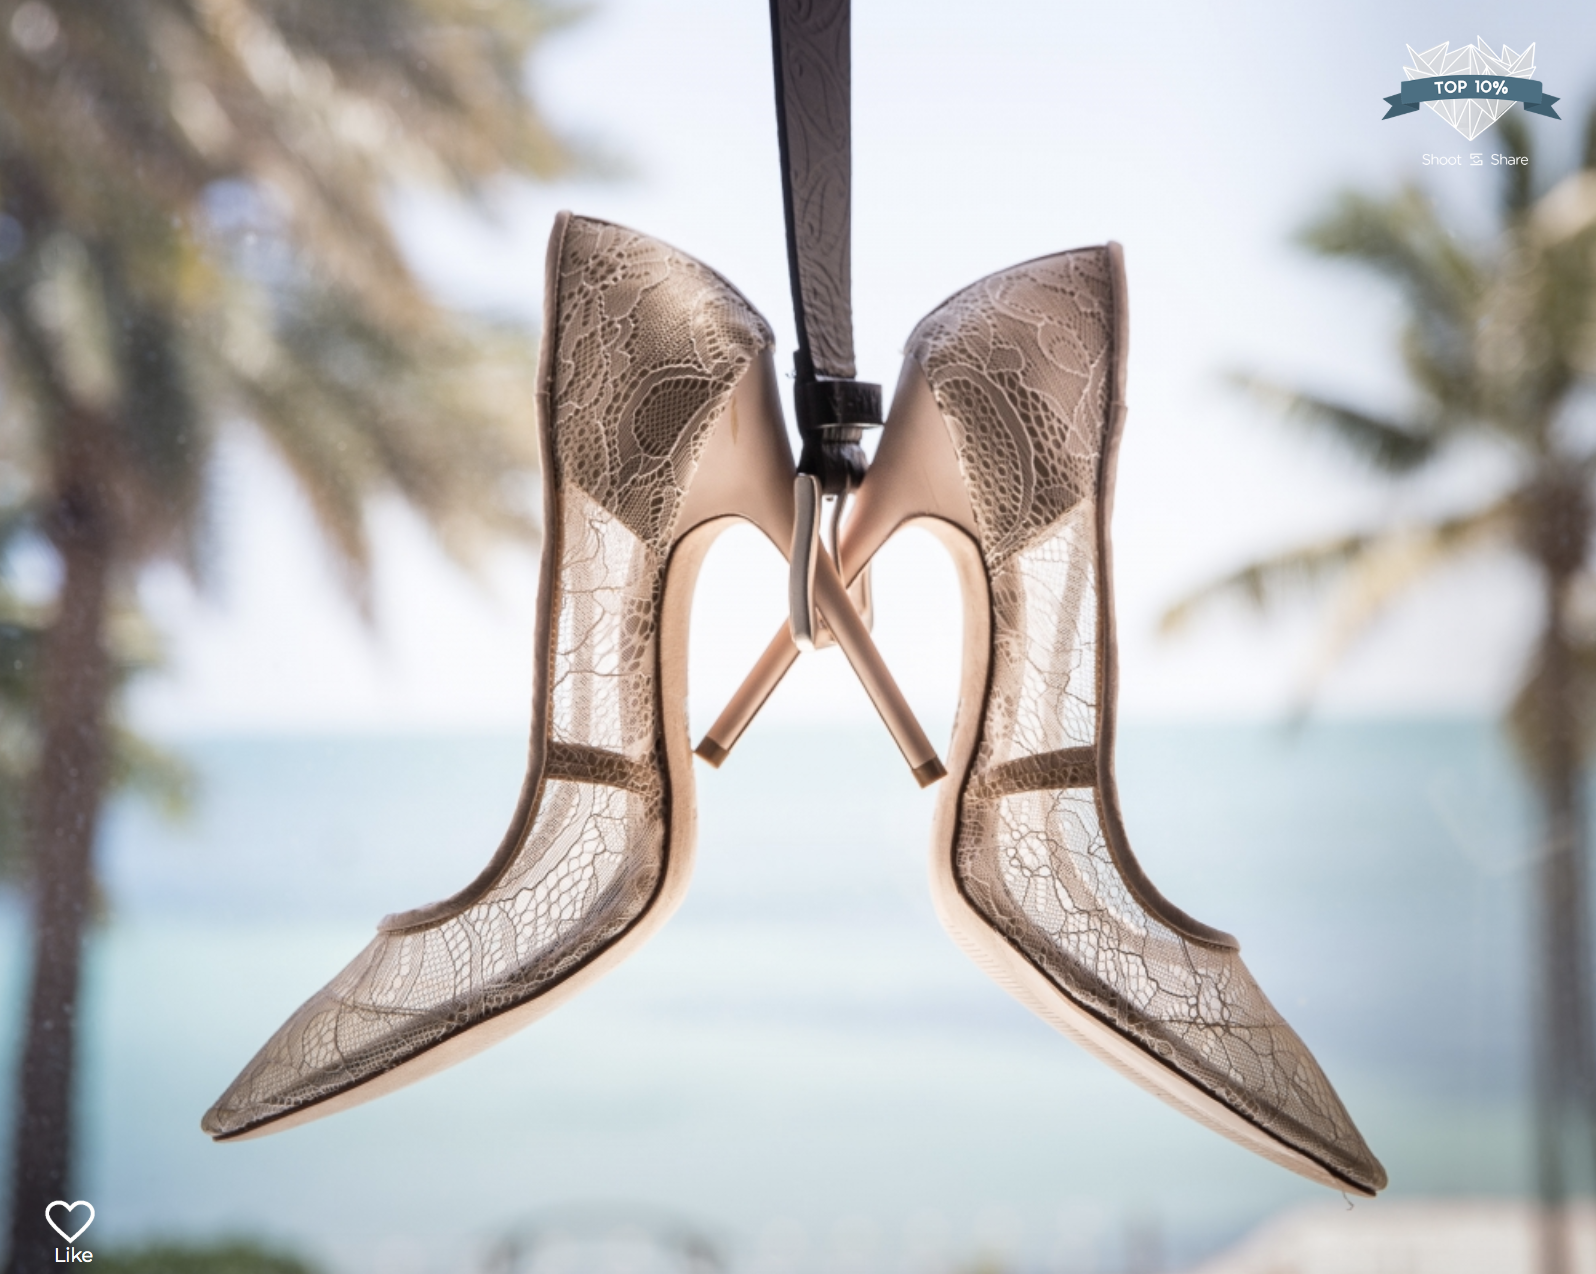 Key West Photographer wins top 10 photography award.png